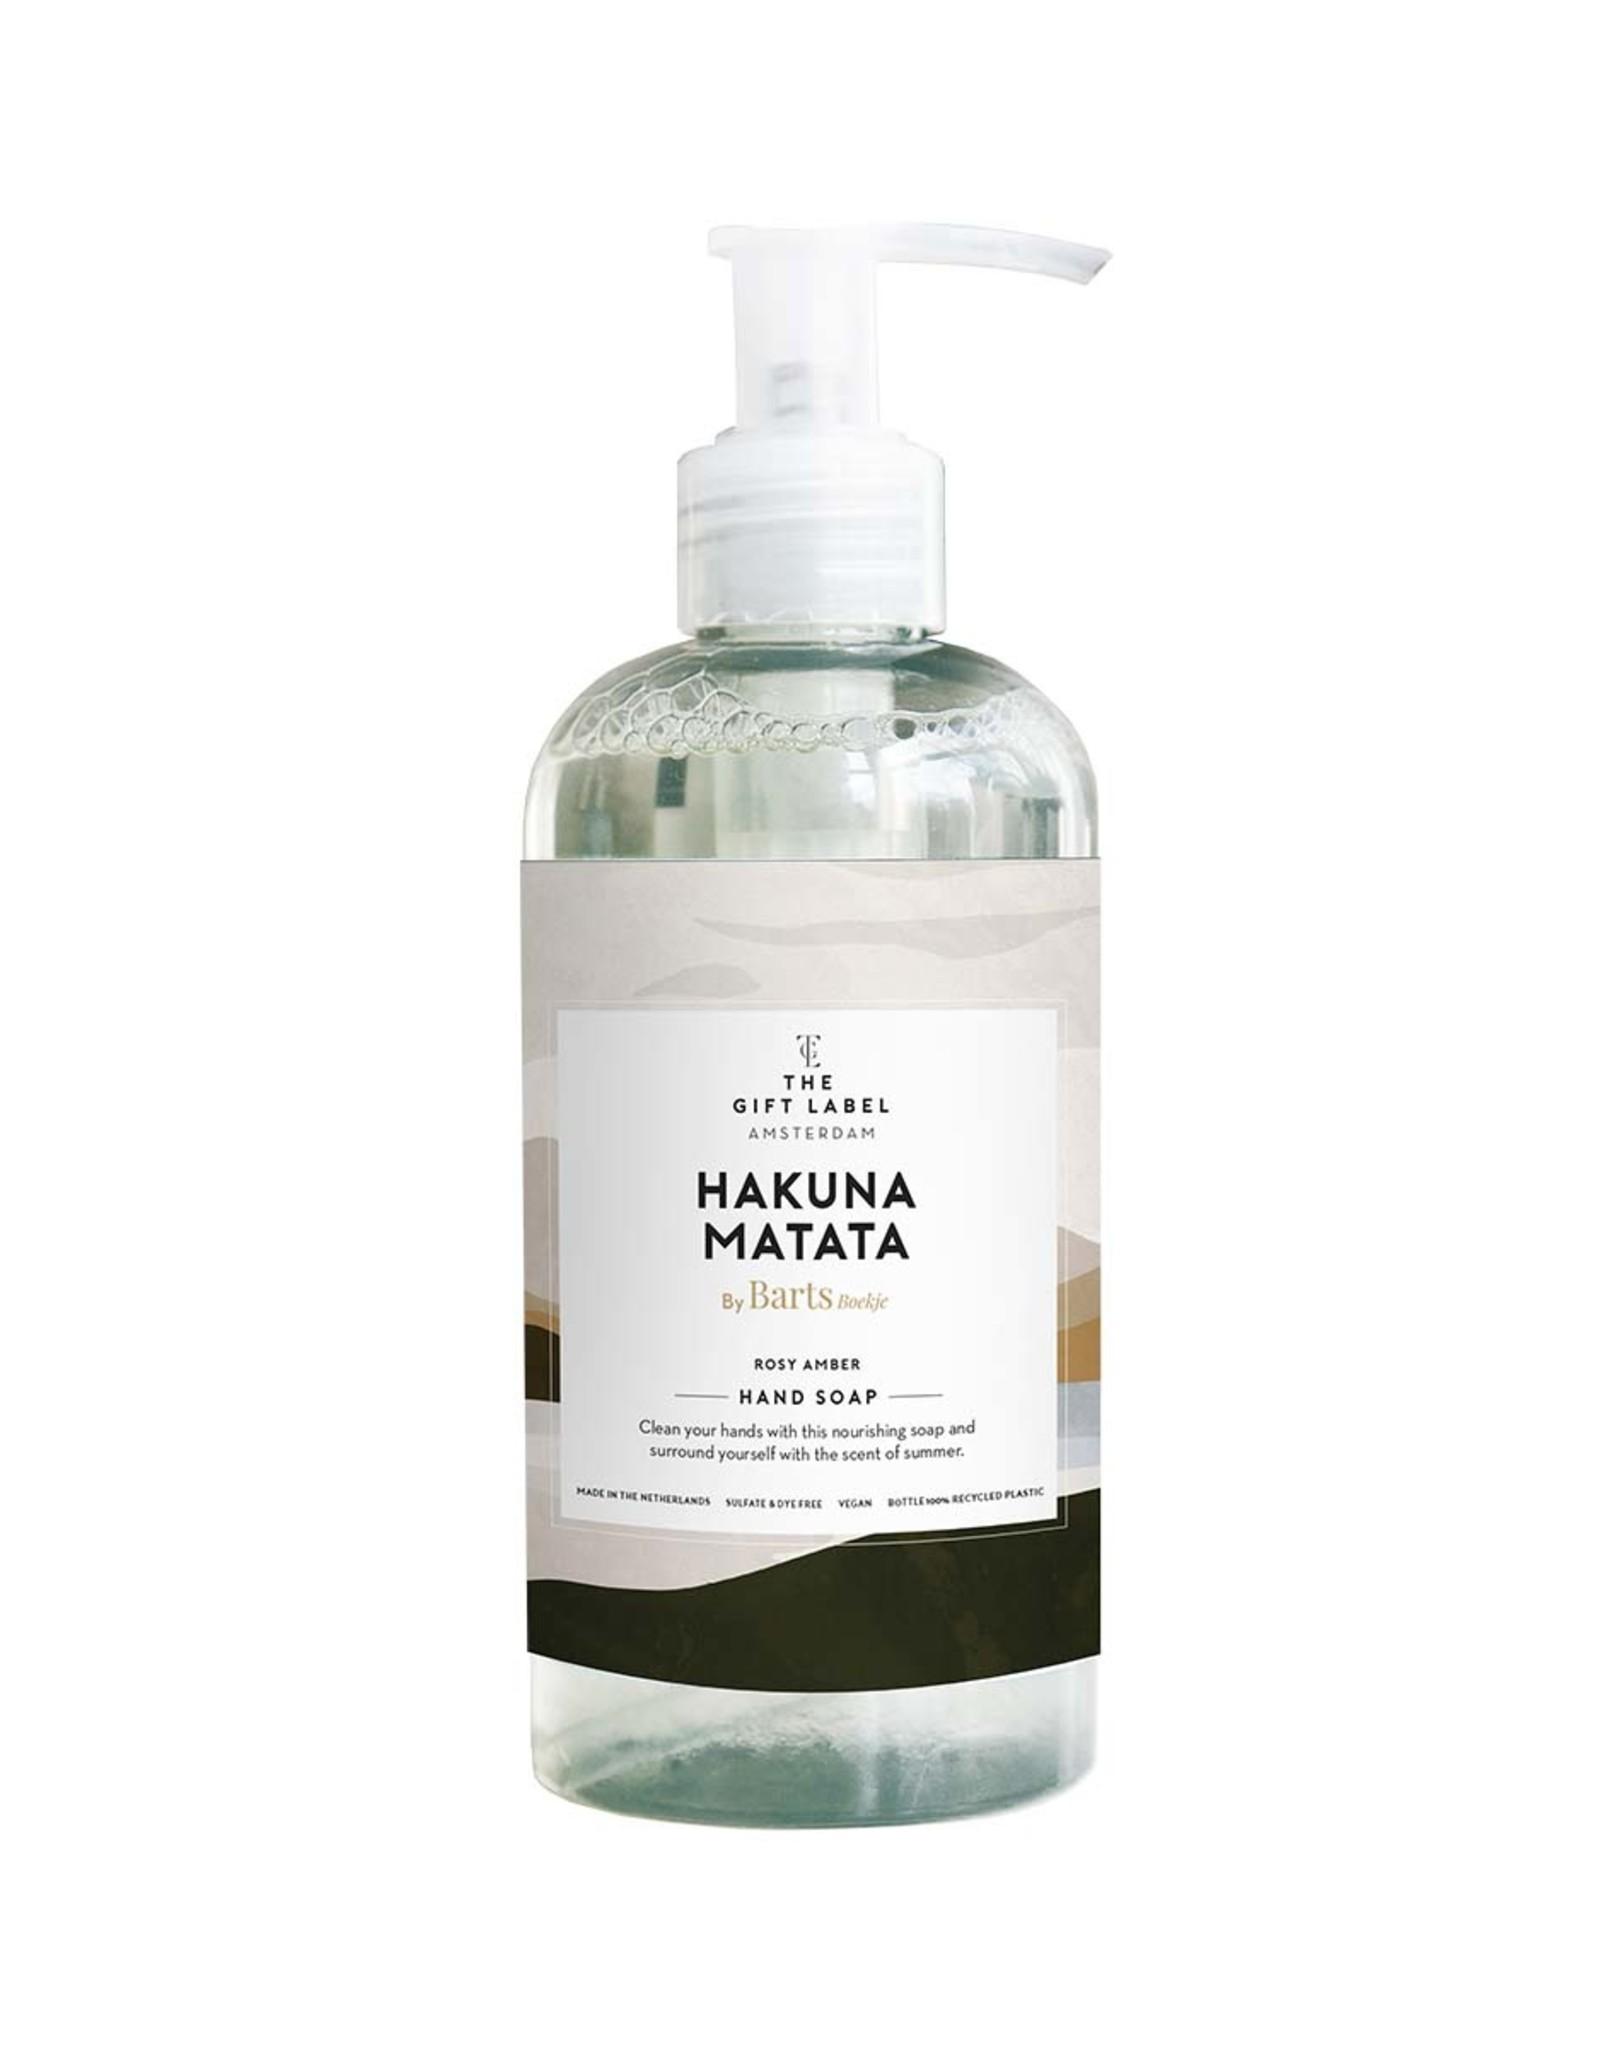 The Gift Label The Gift Label Hand Soap Hakuna Matata